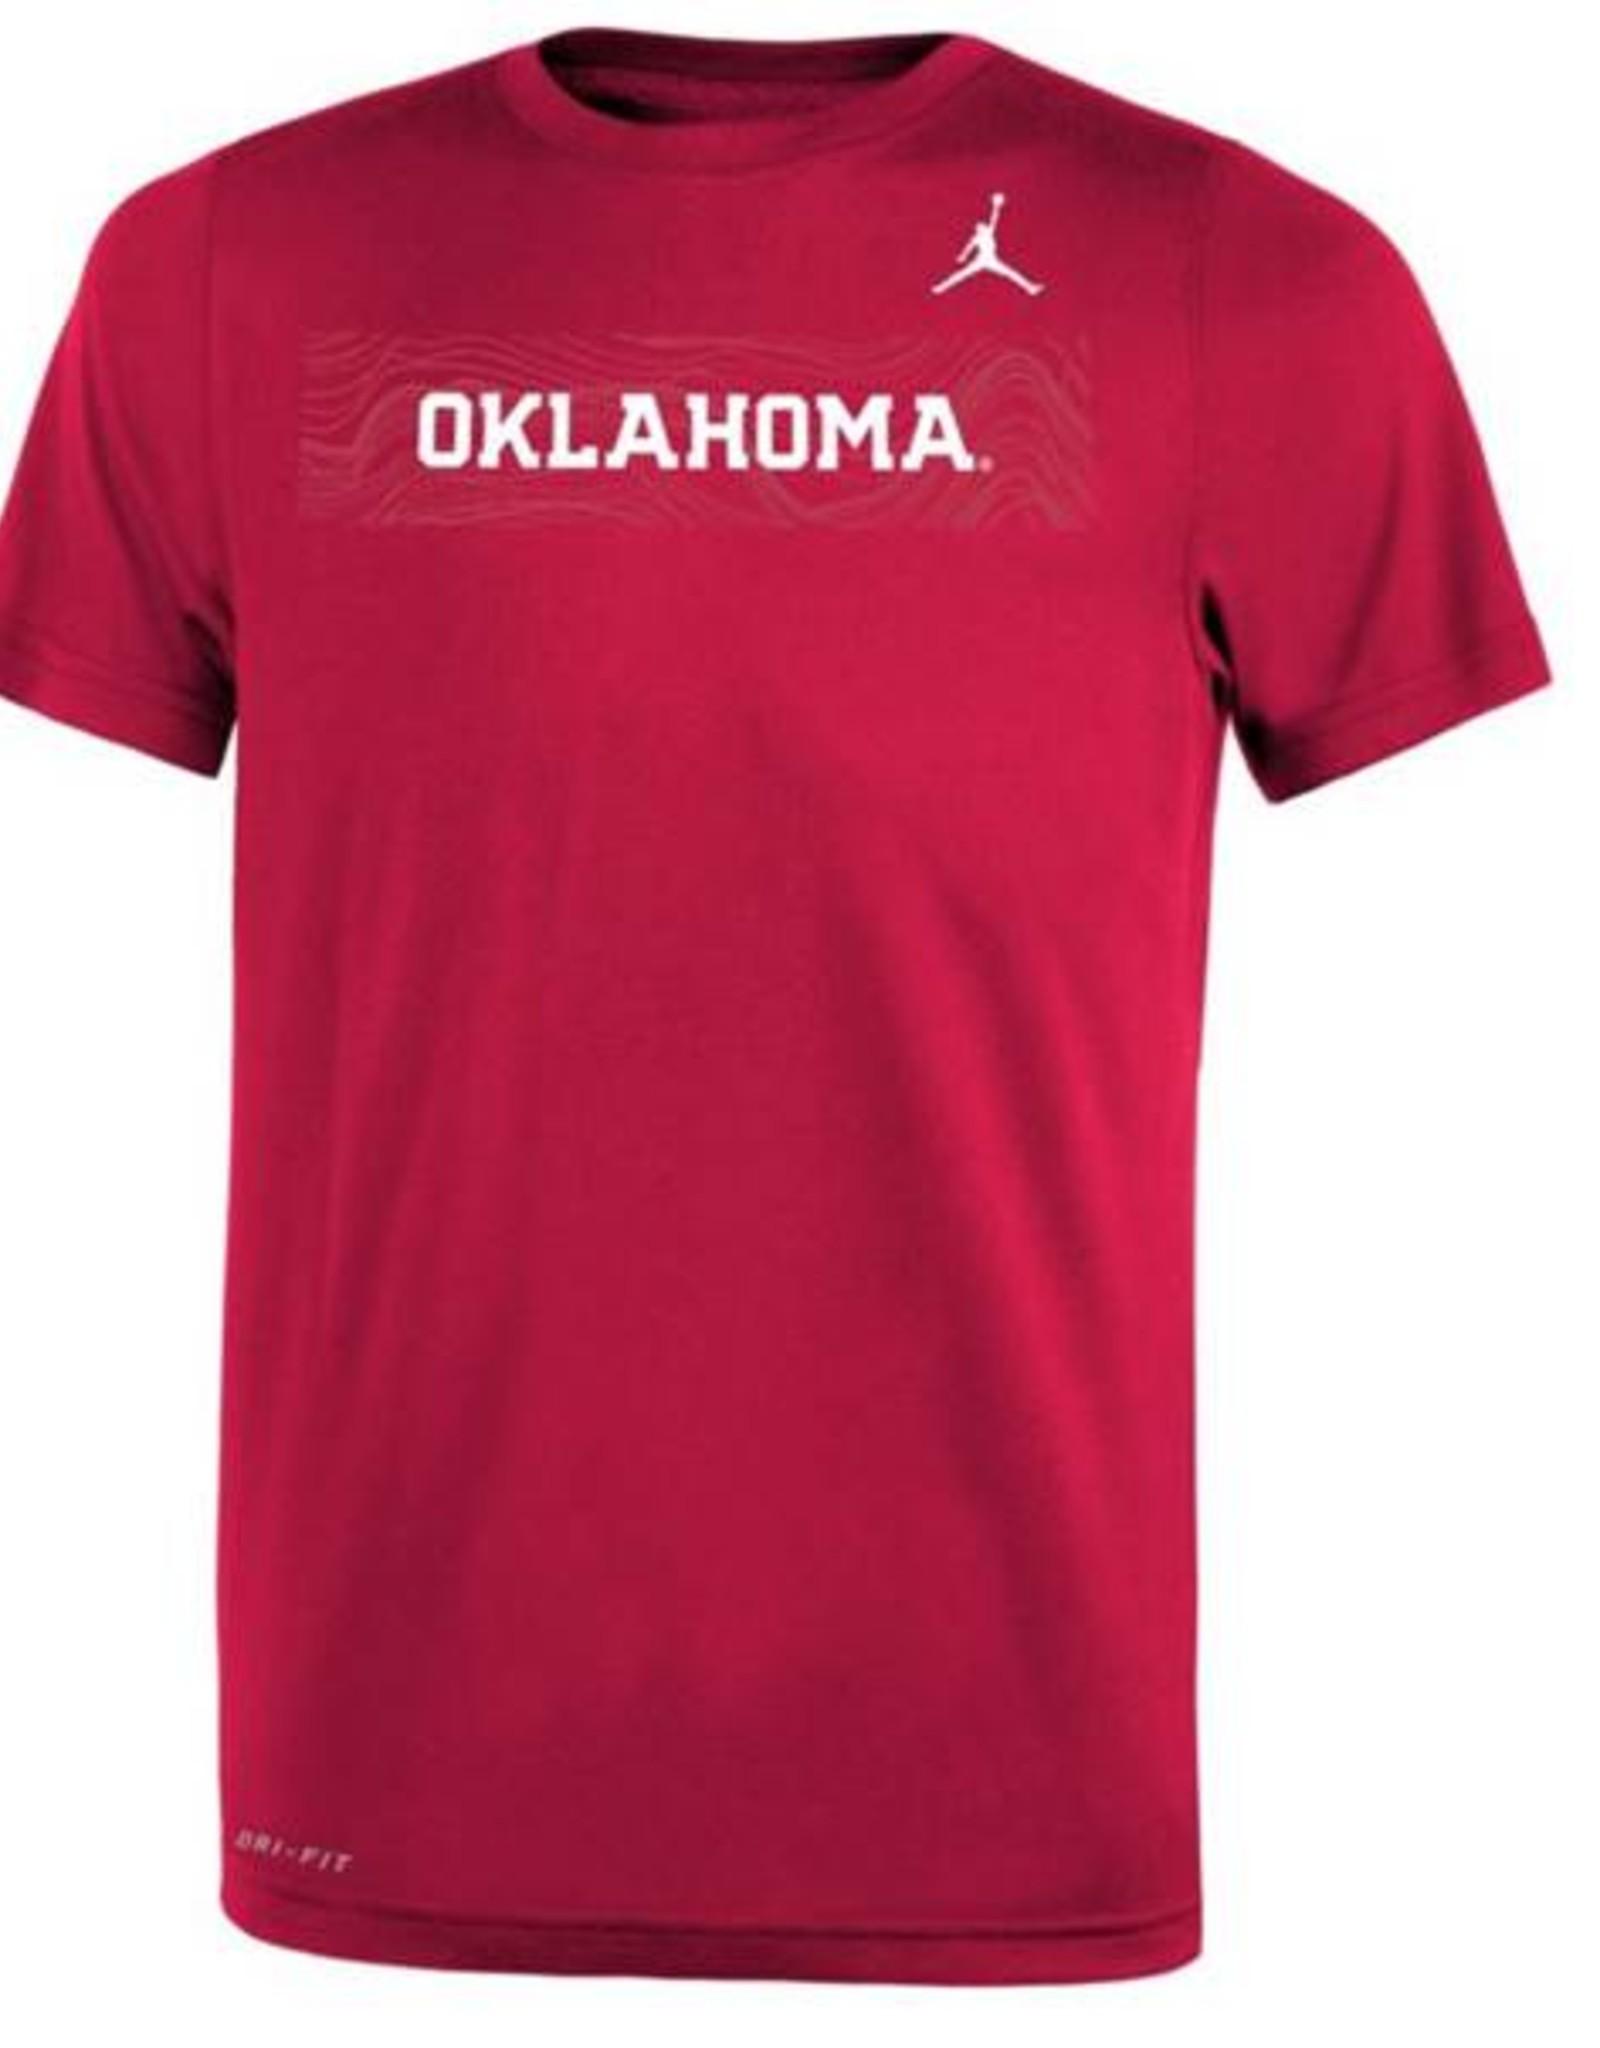 Jordan Youth Nike DriFit Oklahoma Sideline Crimson SS Tee